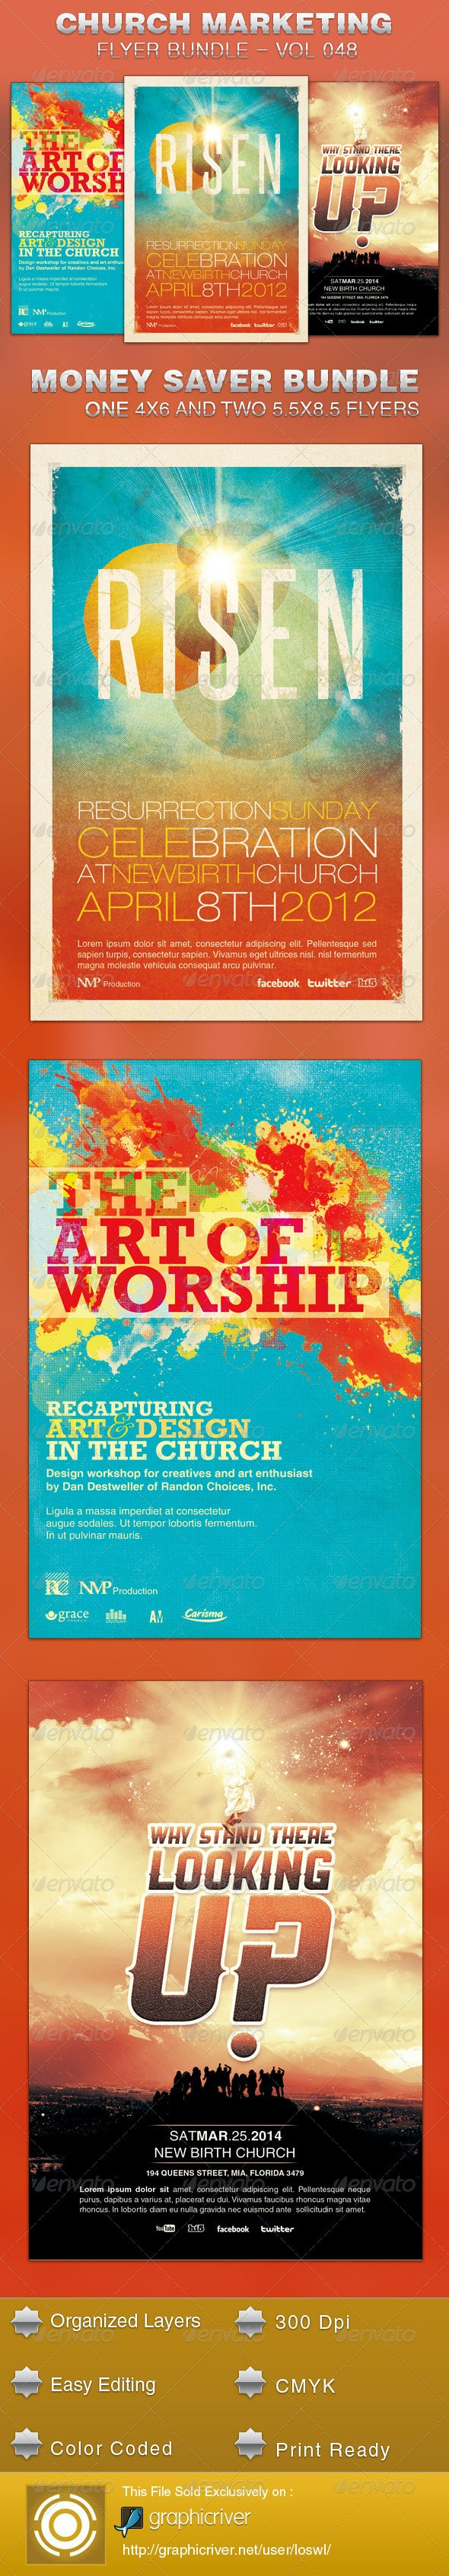 Church Marketing Flyer Template Bundle Vol 048 - Church Flyers